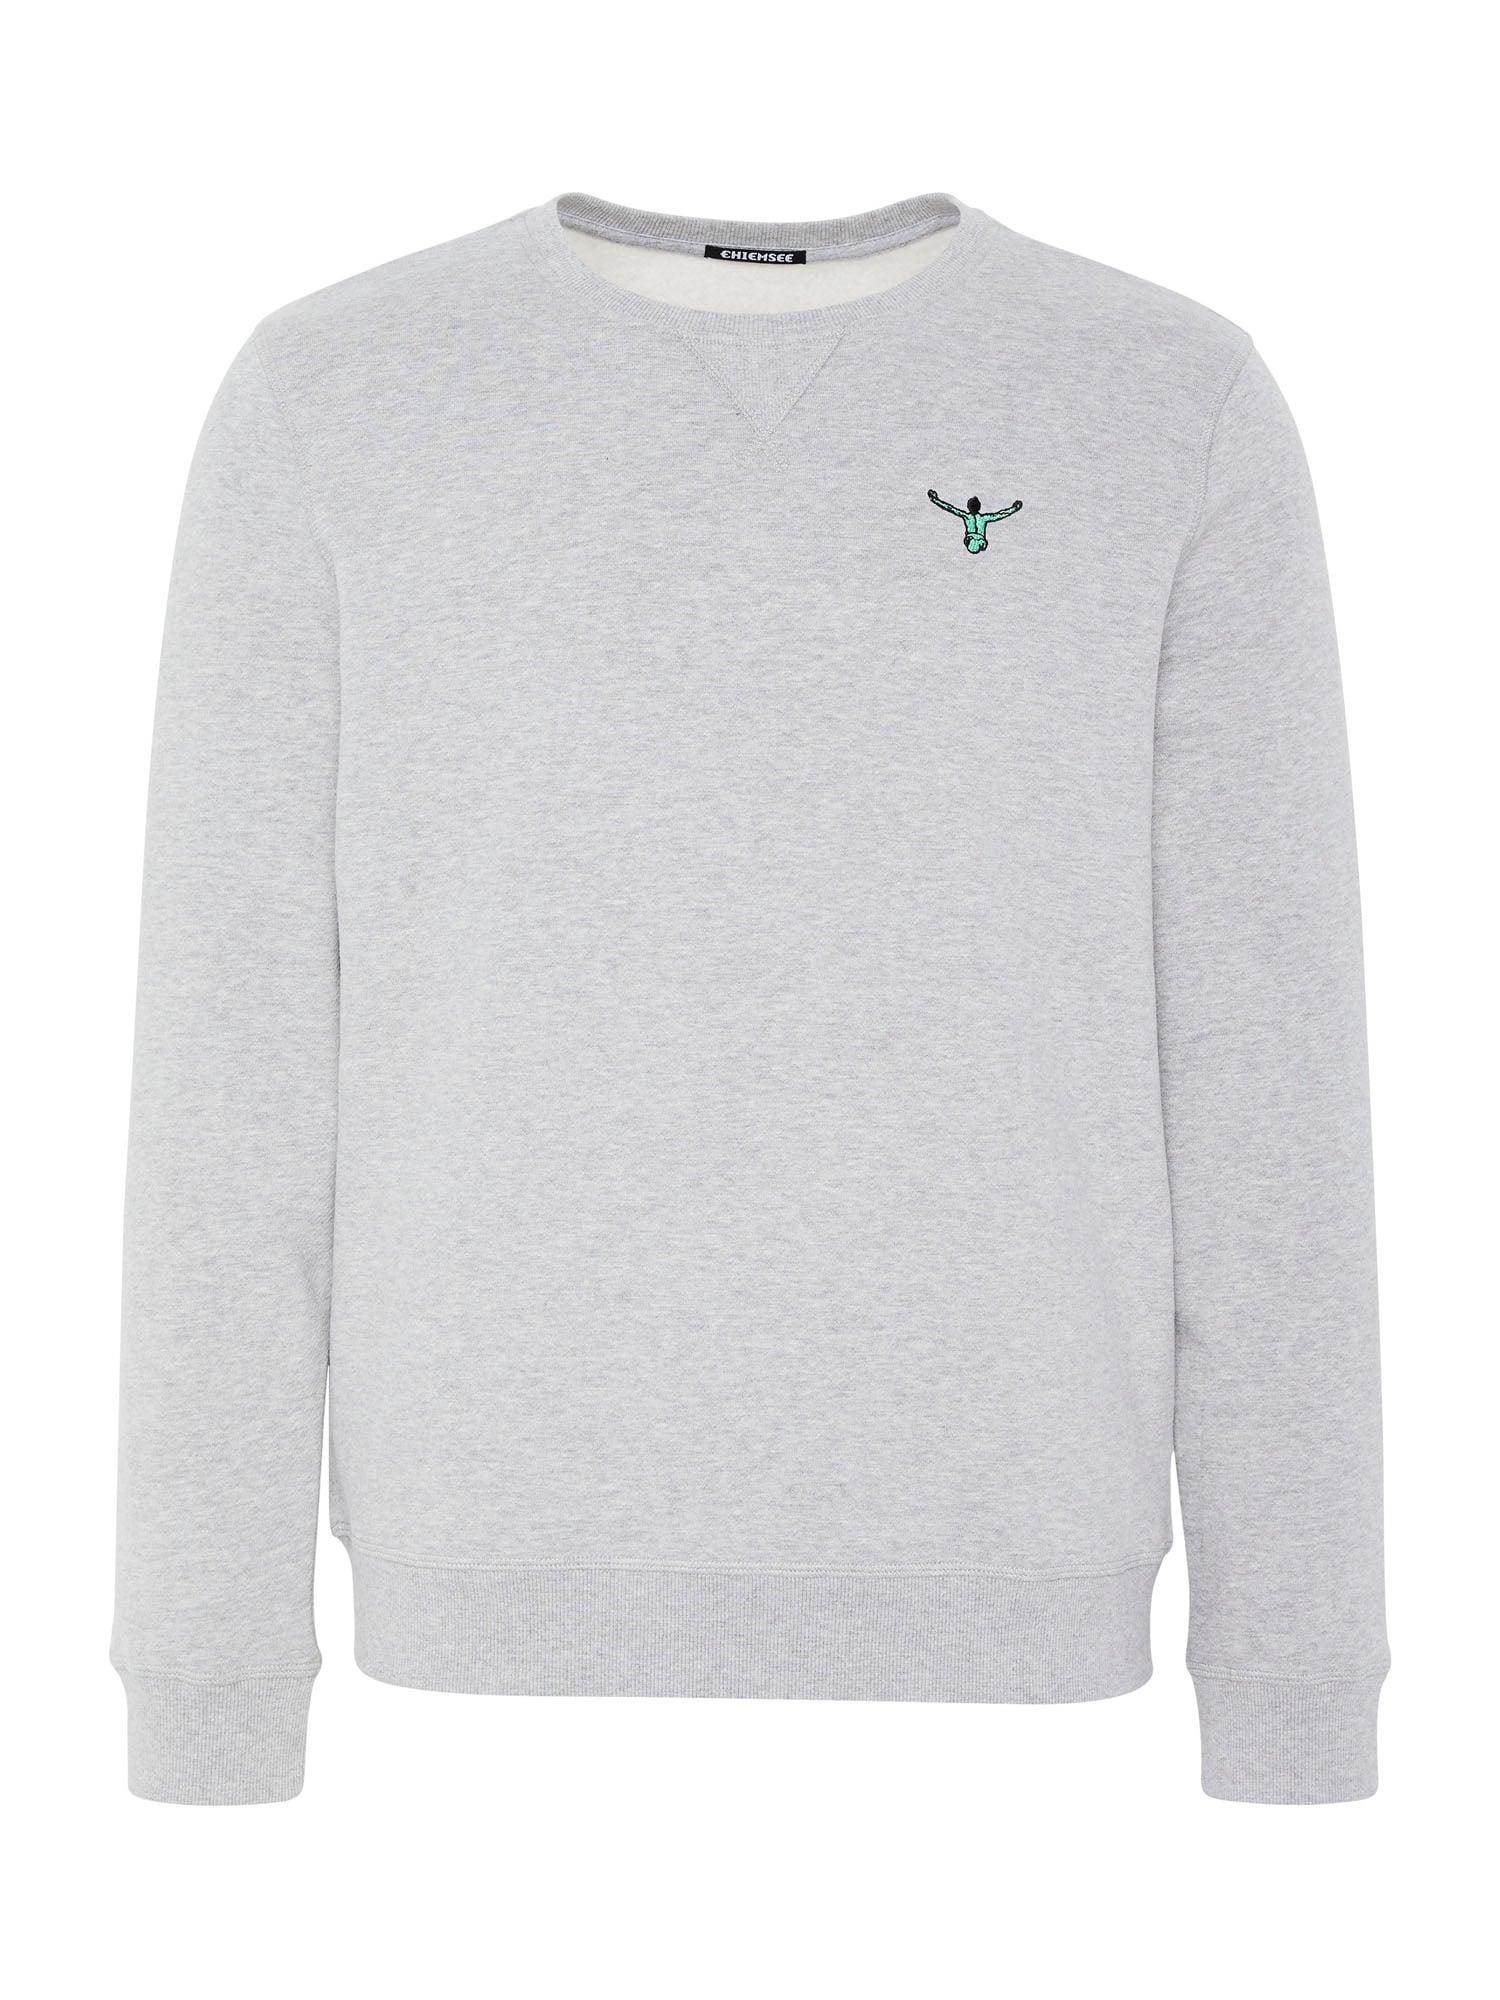 CHIEMSEE Sportinio tipo megztinis mėlyna / pilka